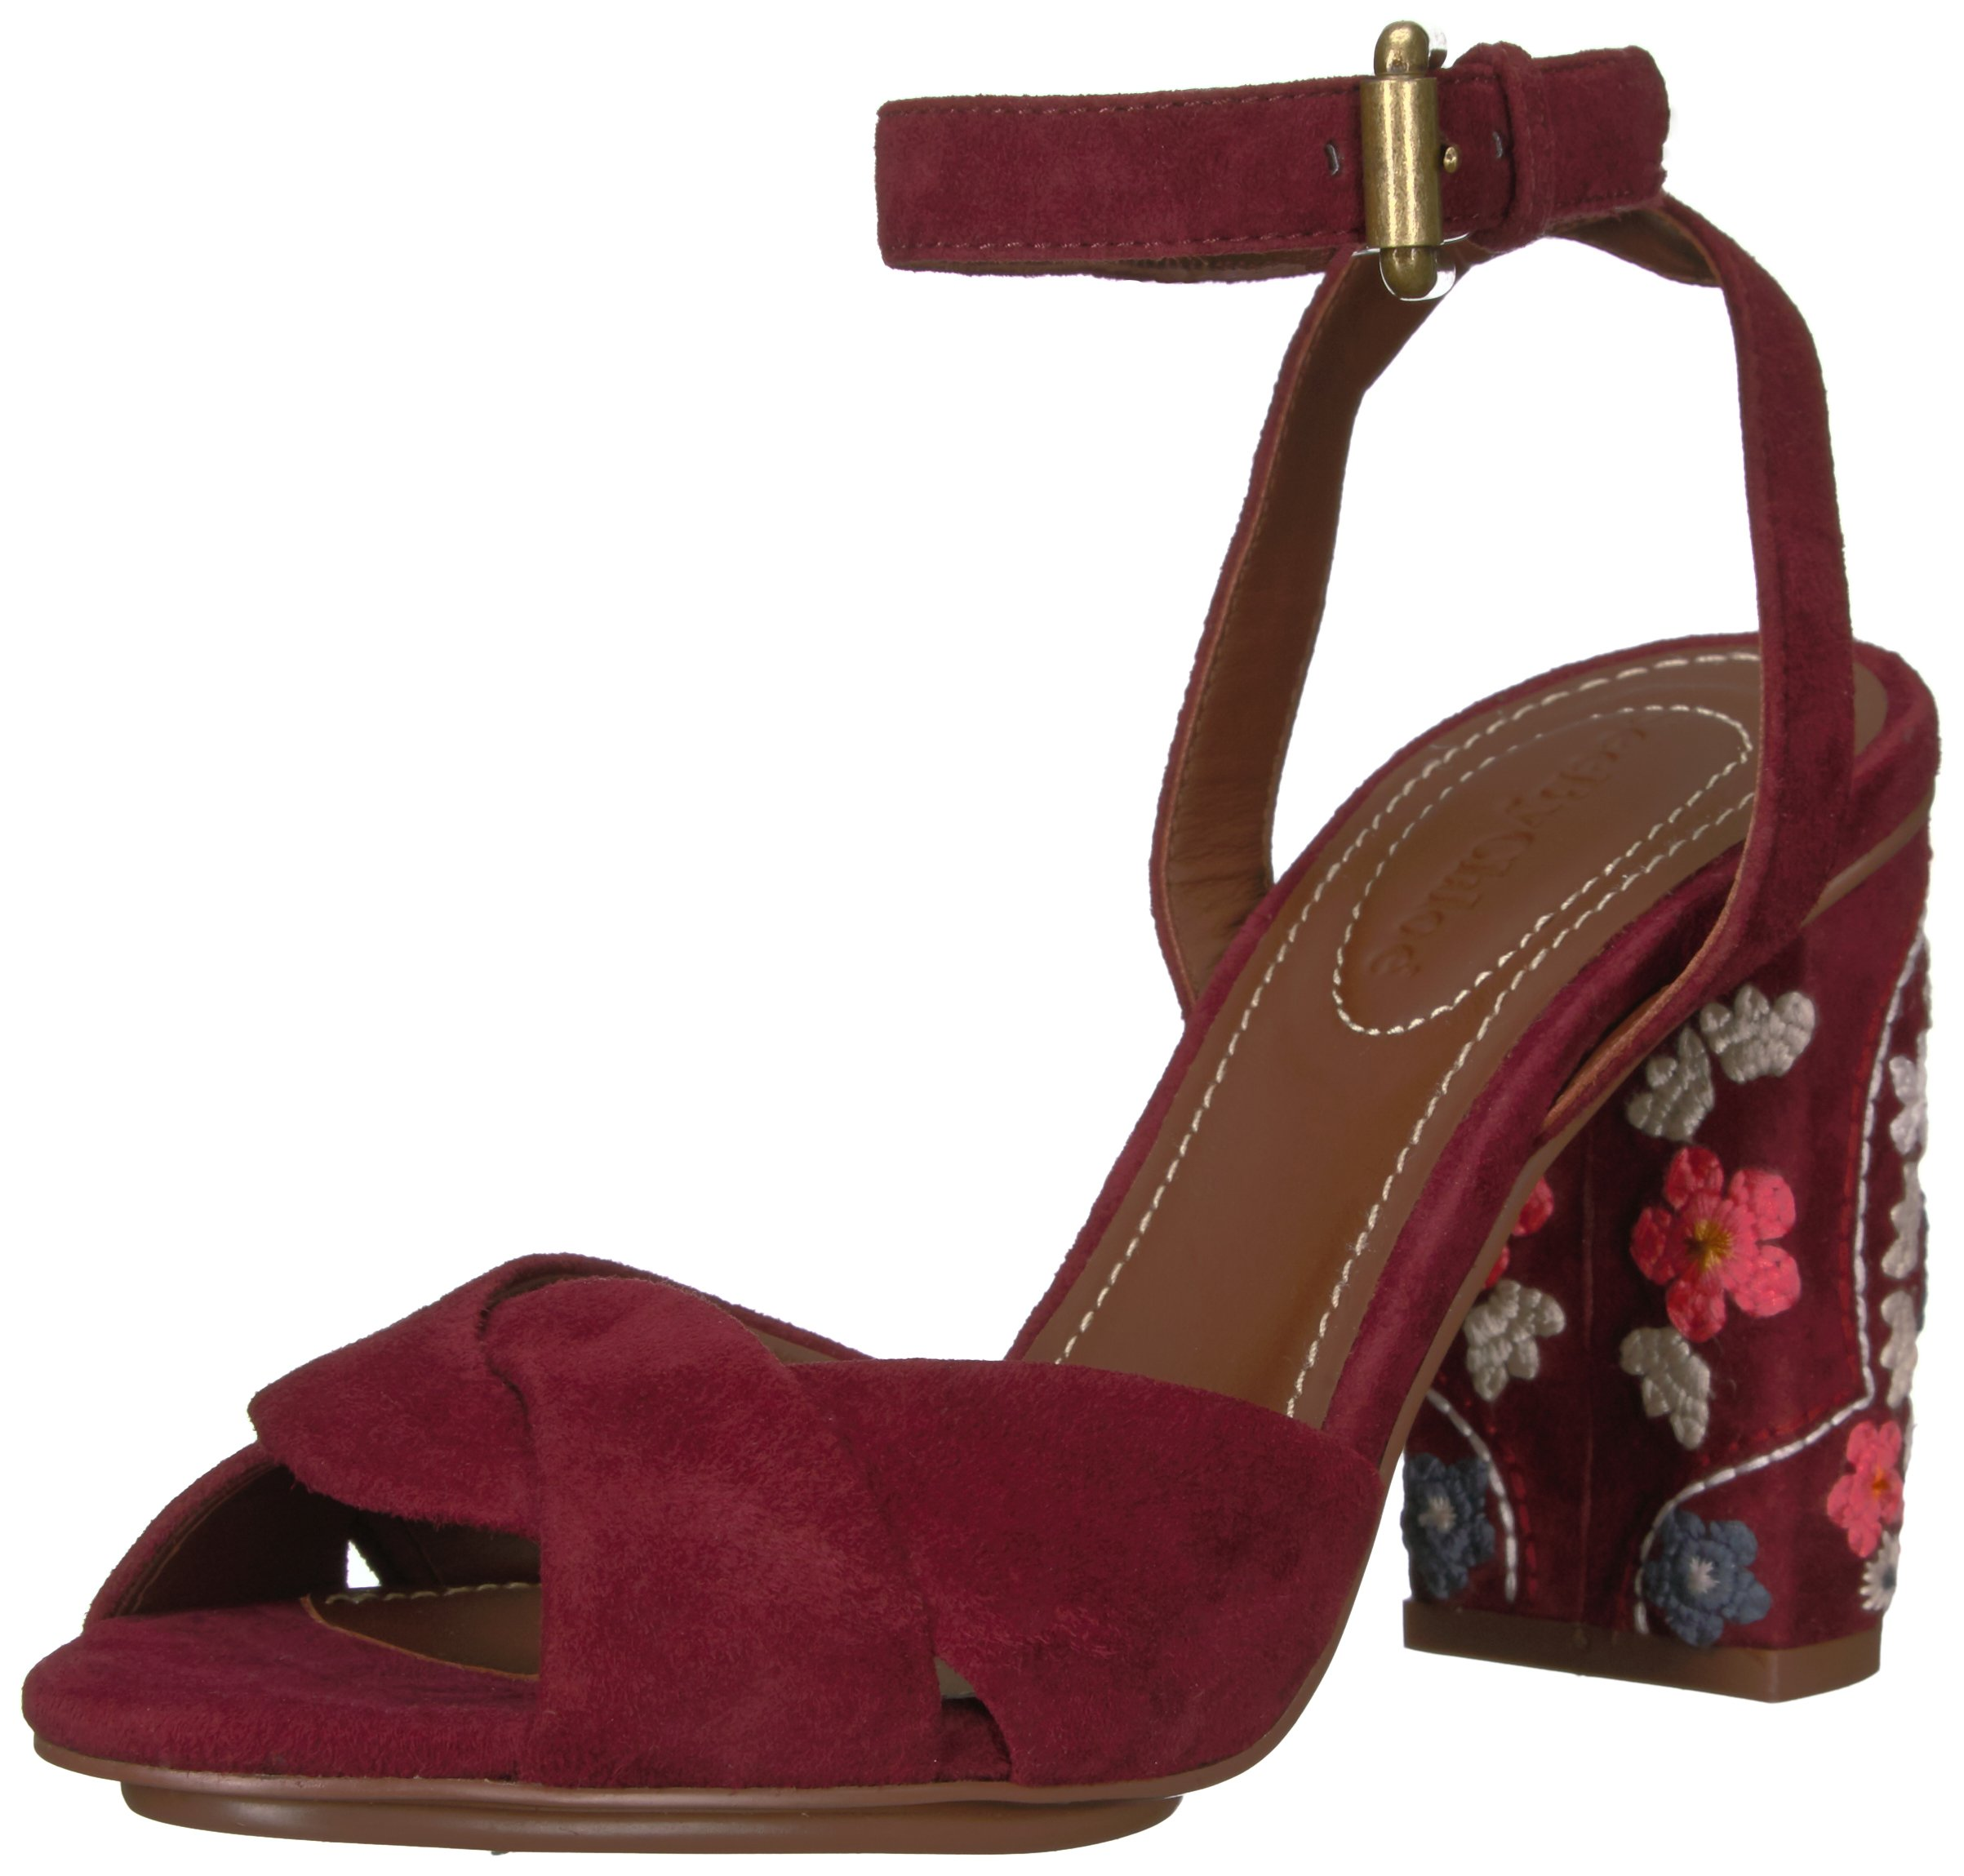 See By Chloe Women's Galya Heeled Sandal, Merlot, 38 M EU (8 US)